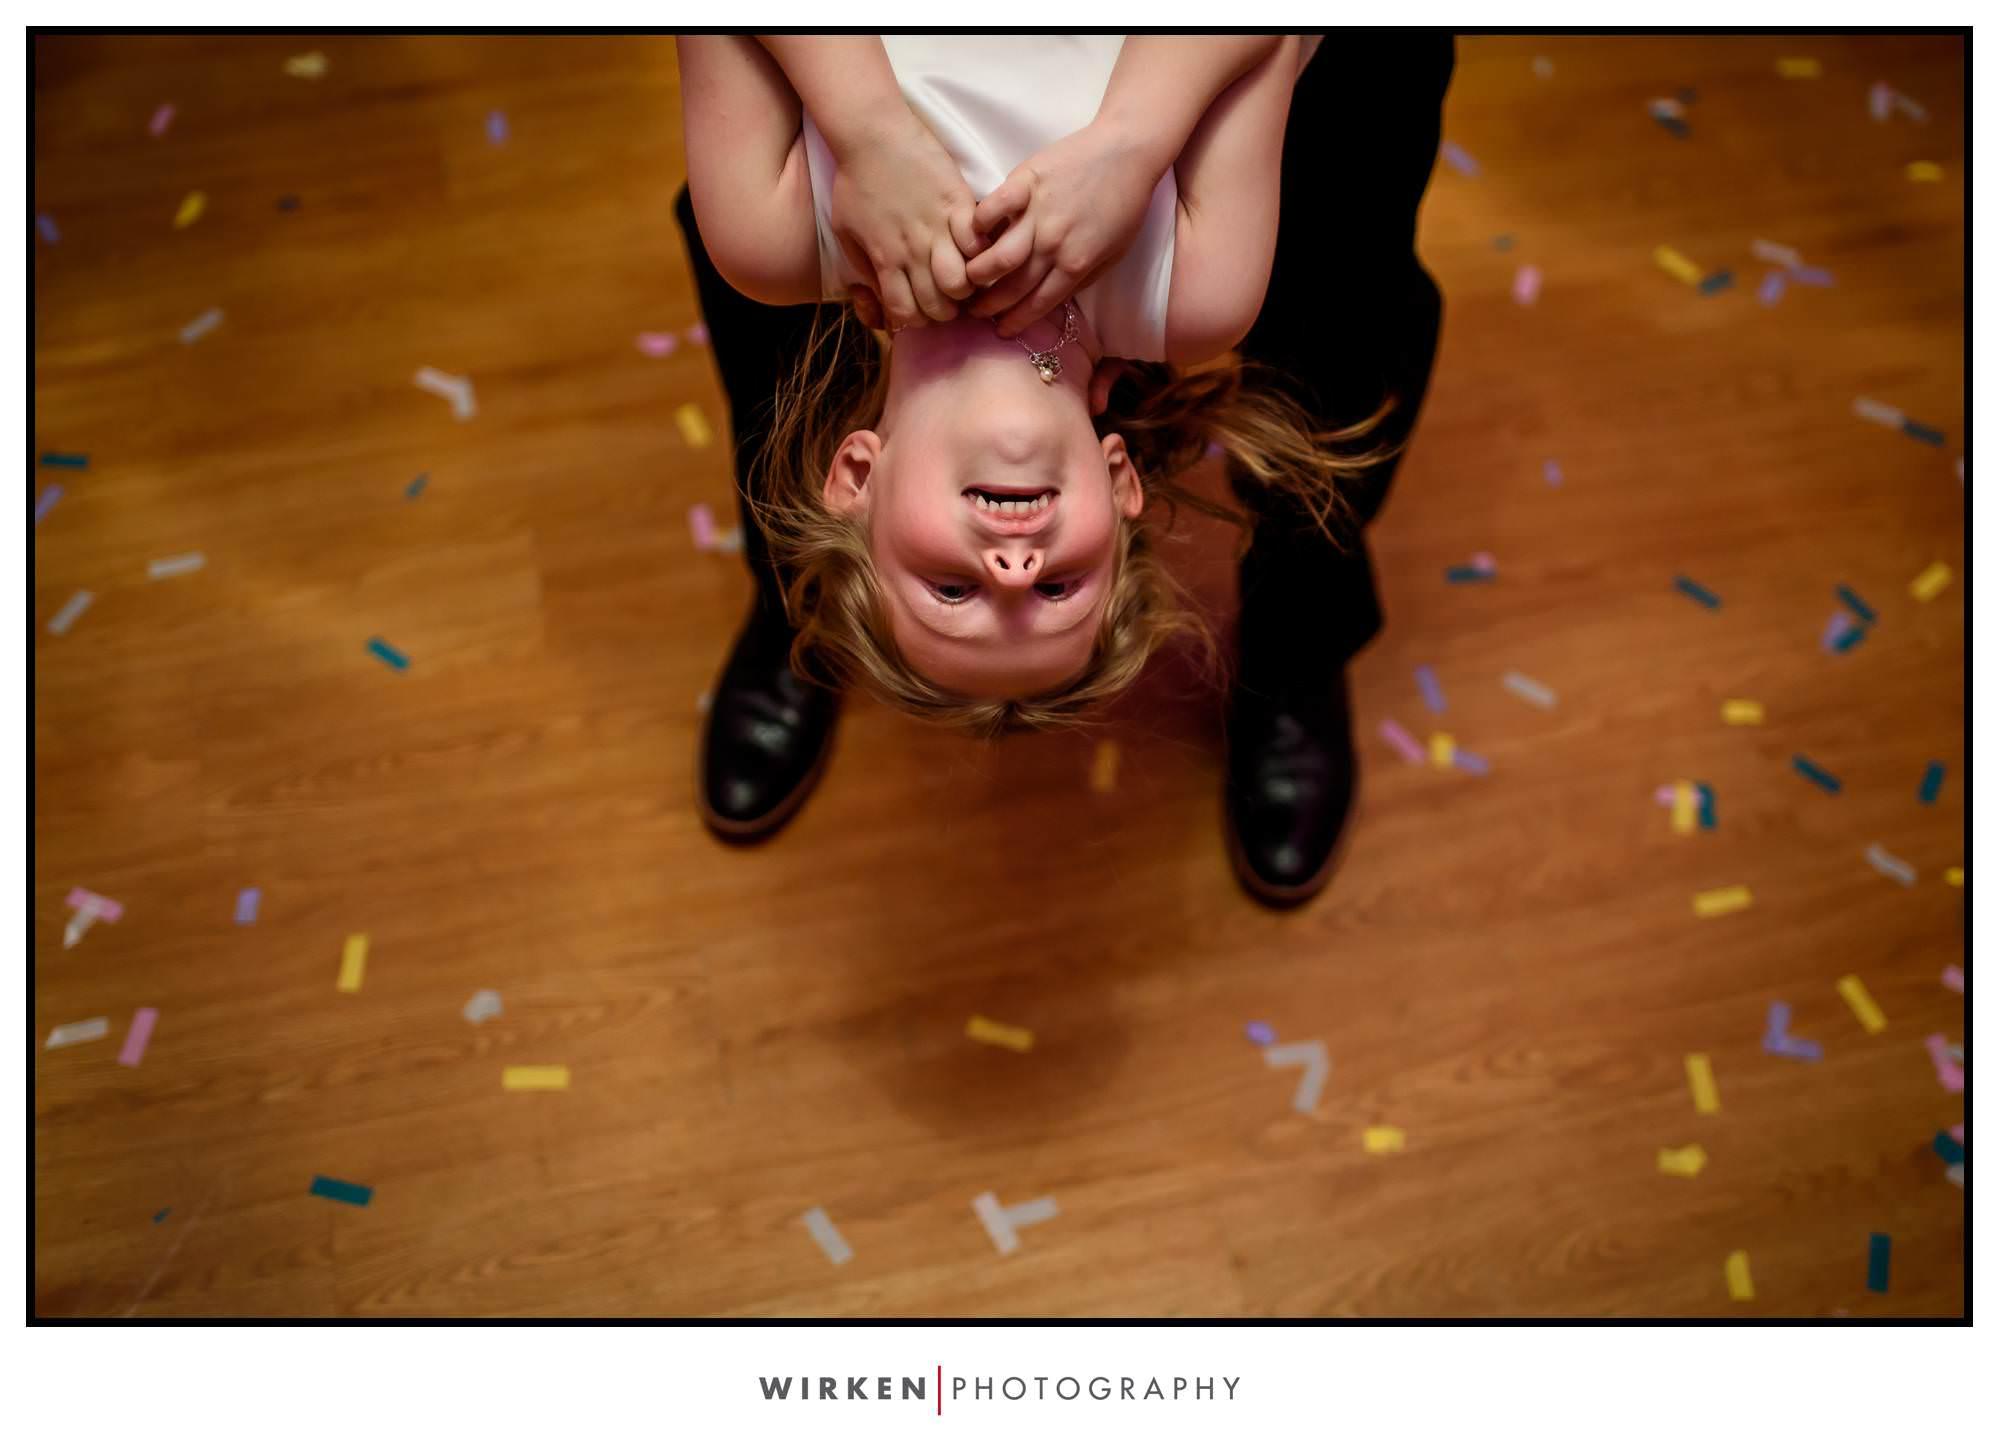 The gallery event center wedding reception dance floor.